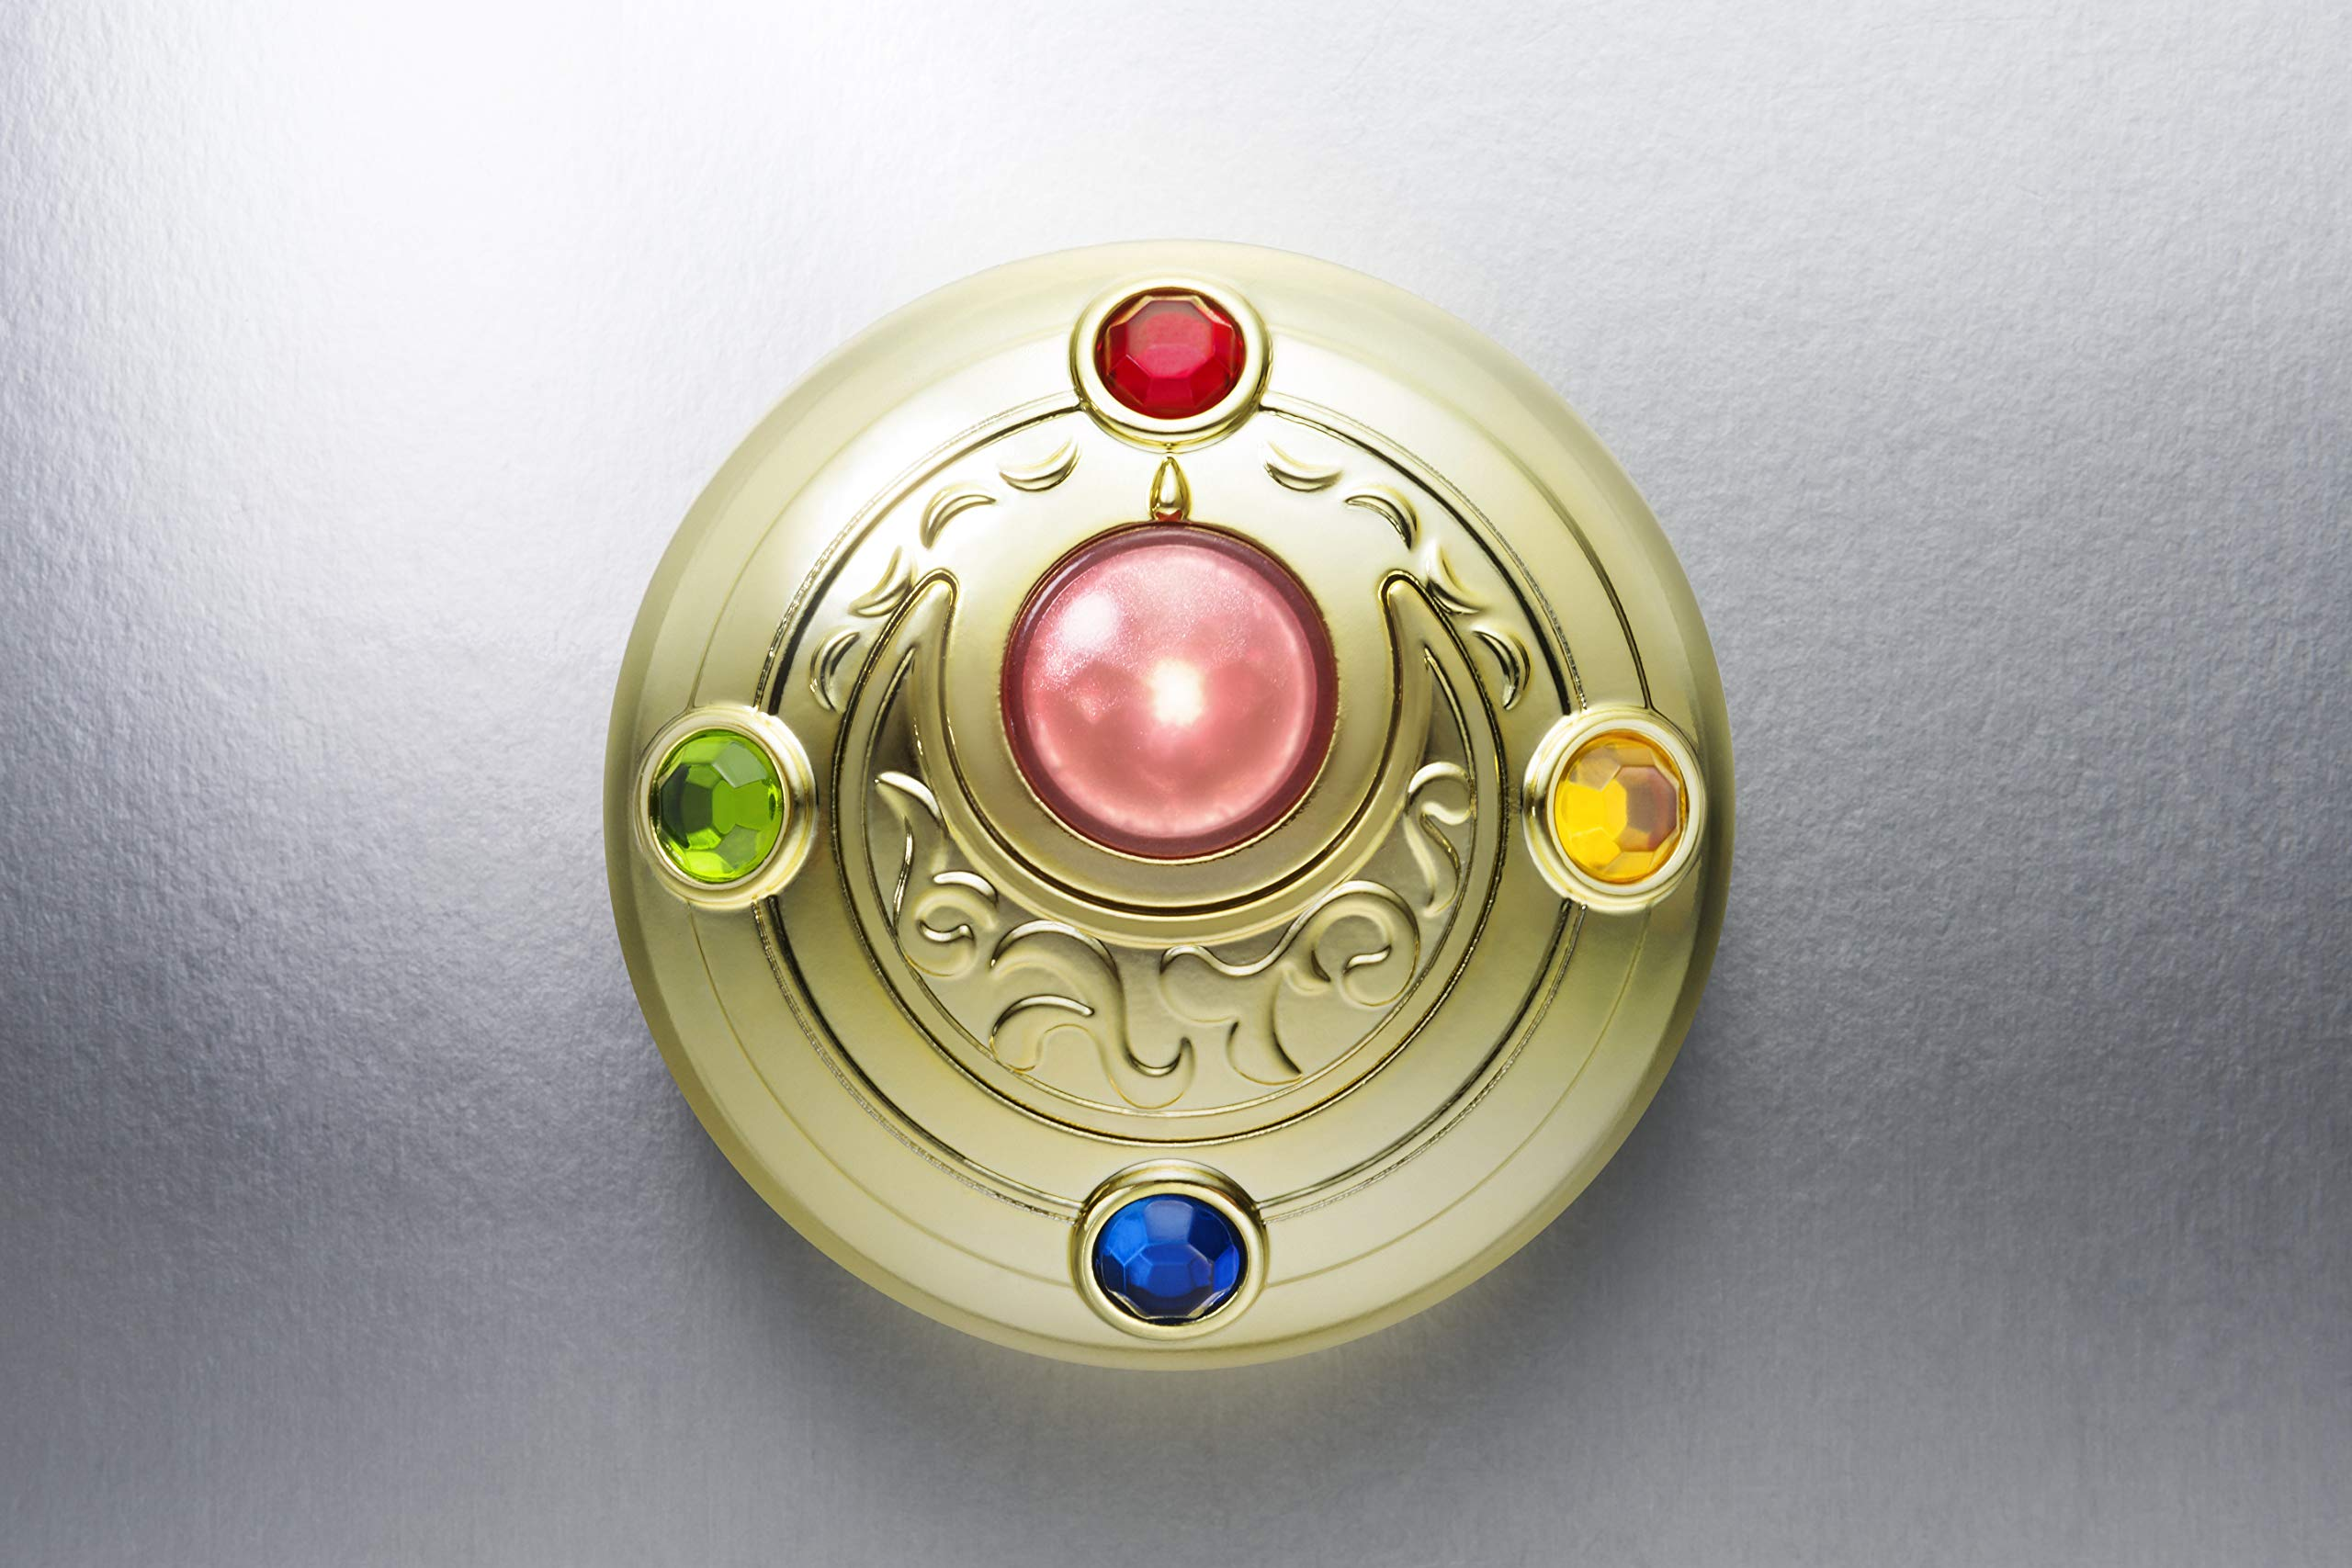 Bandai Tamashii Nations Proplica Transformation Brooch & Disguise Pen Set ''Sailor Moon'' Statue by Tamashii Nations (Image #11)